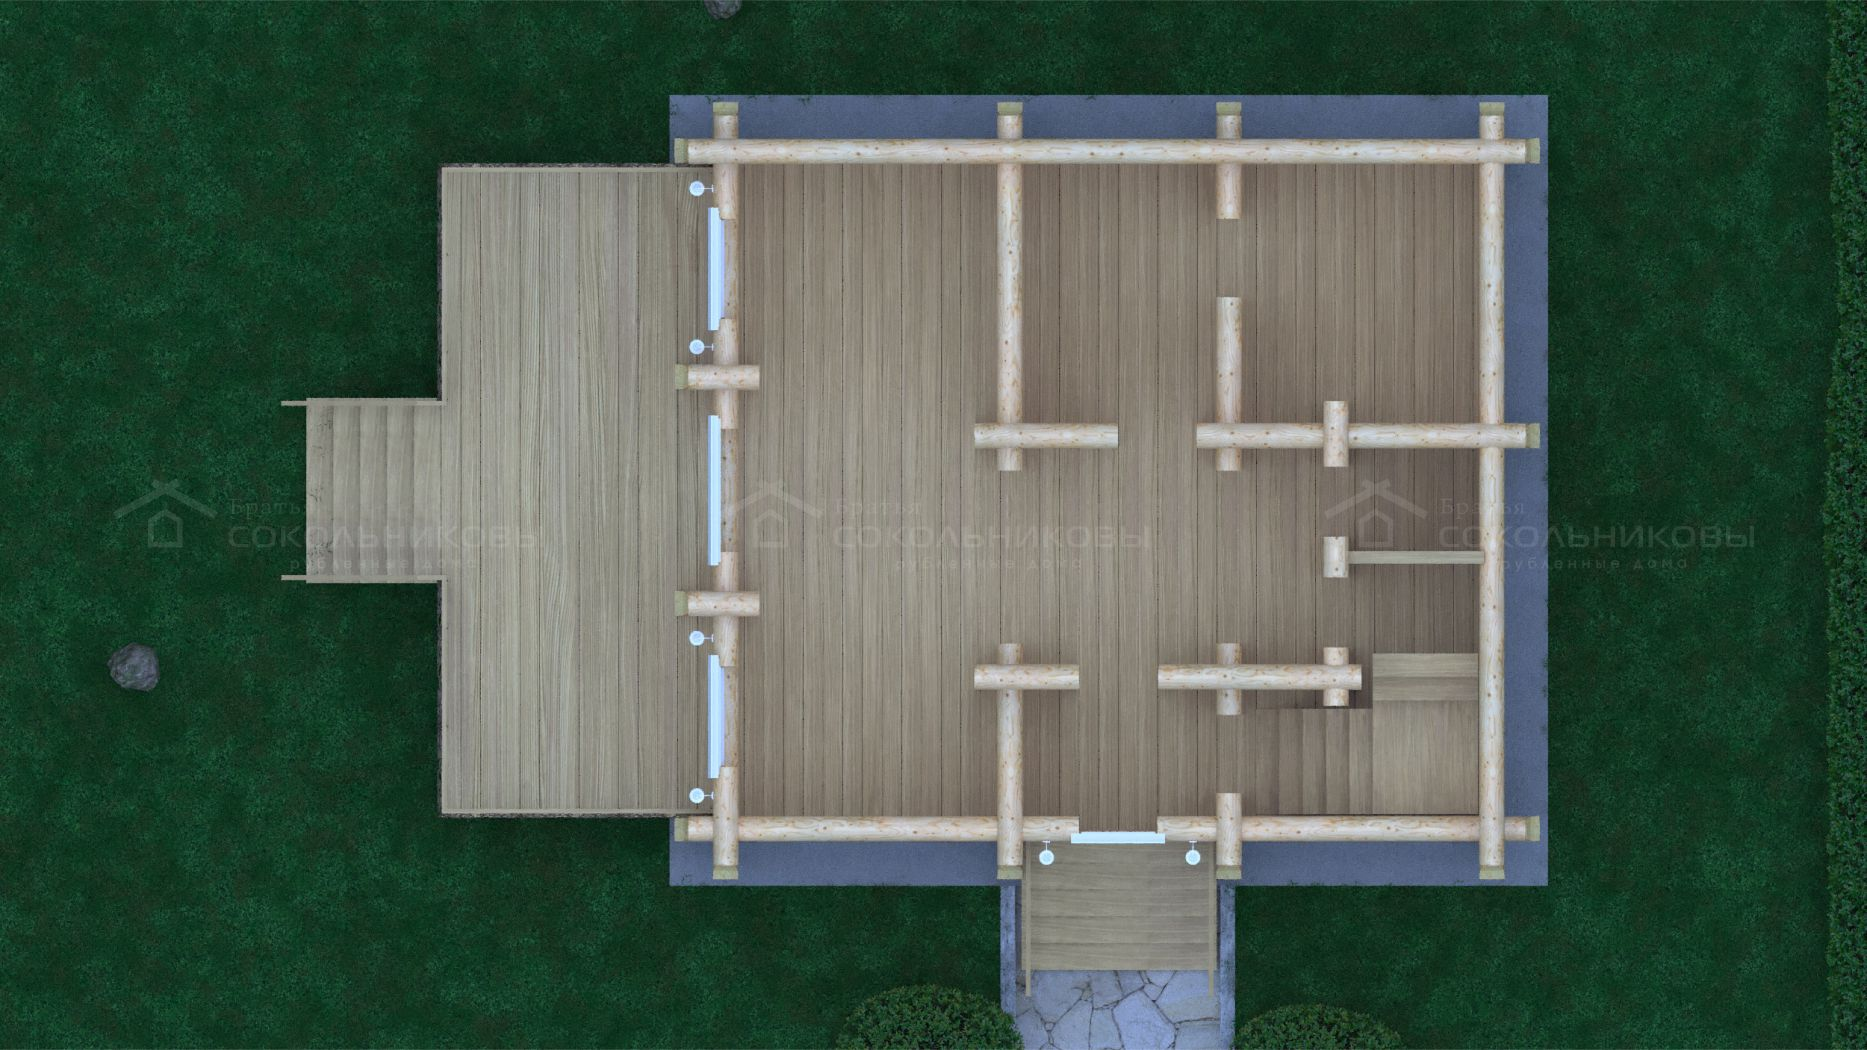 Дом-баня под рубанок, 130 кв. м, фото 7